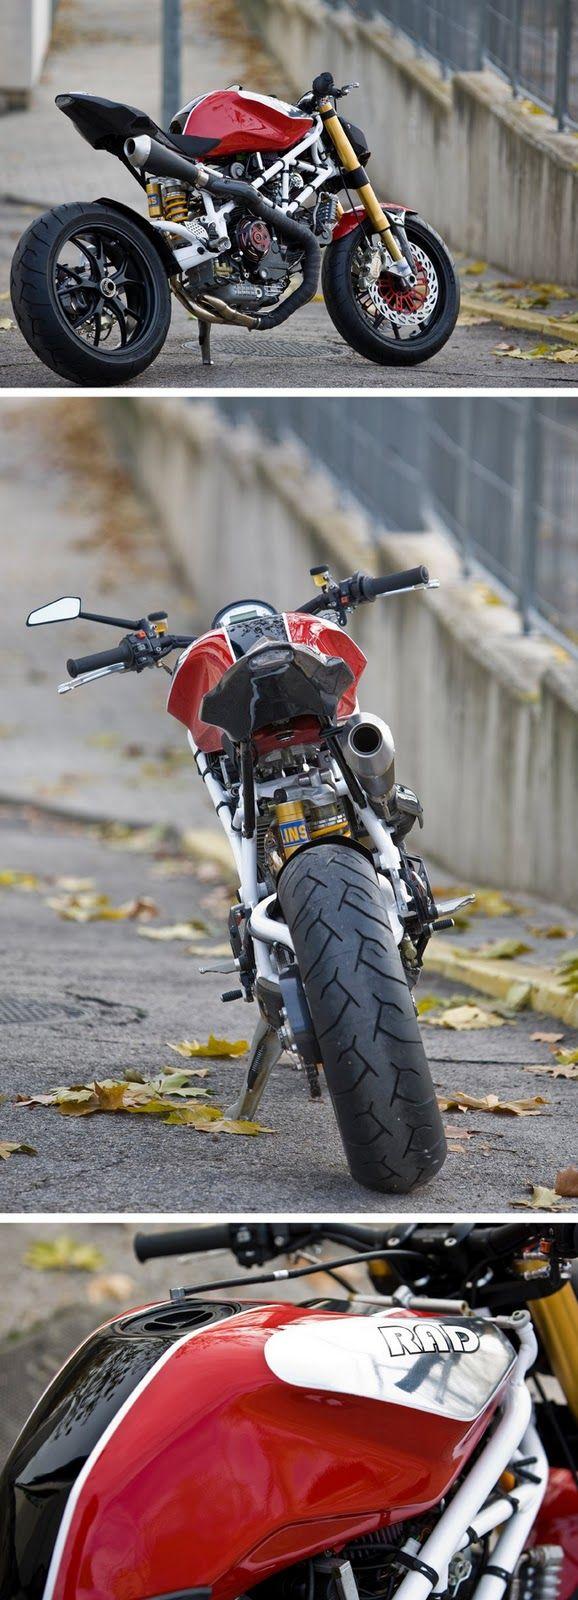 Radical Ducati :: RAD02 Pursang: Radical Pursang, Pursang Ducati, Rad02 Pursang, Pursang Monster, Motion, Ducati Rad02, Ducatis Monster, Ducati Radical